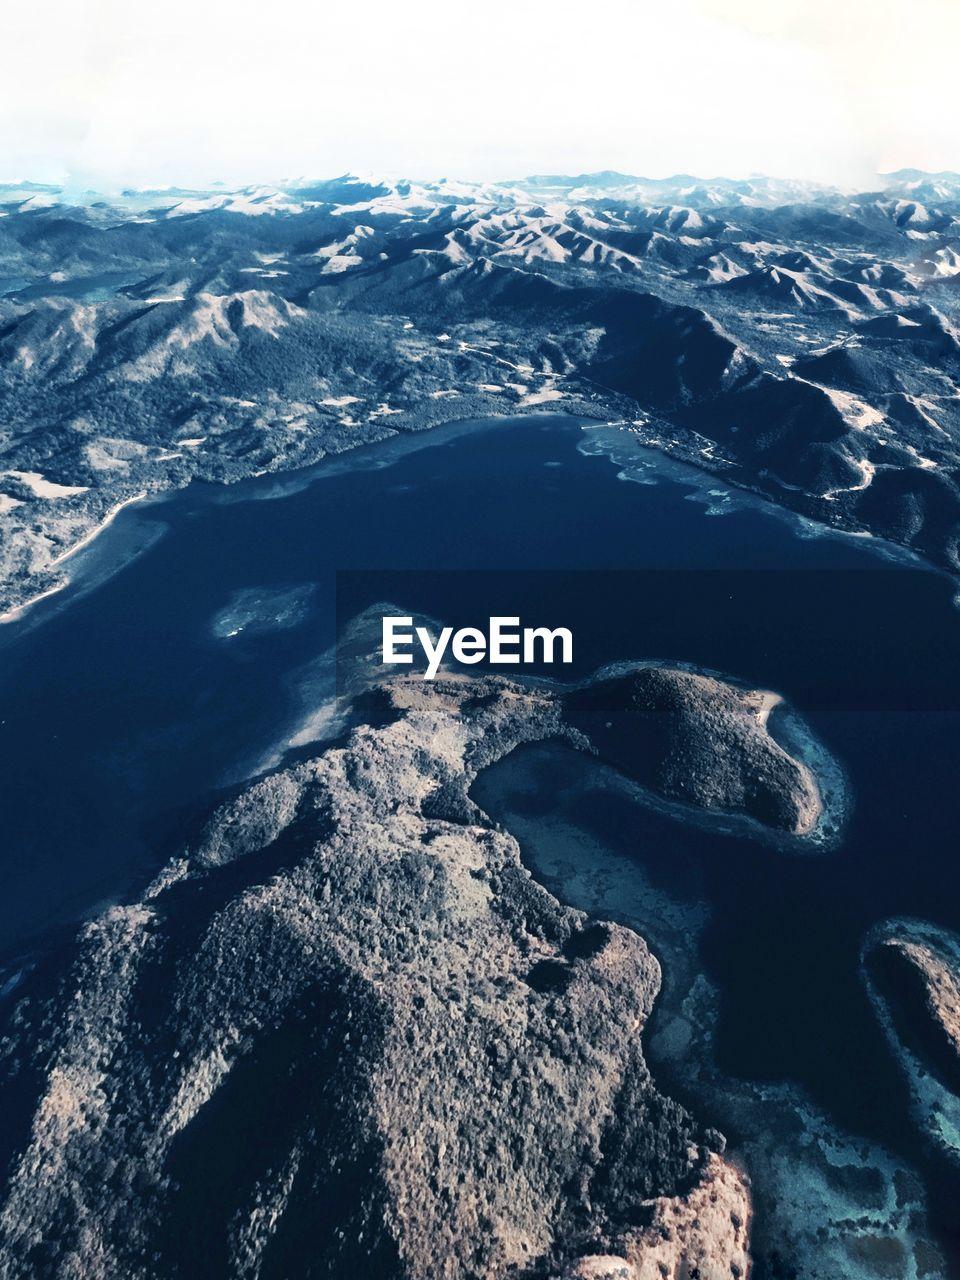 Coron island in palawan aerial view